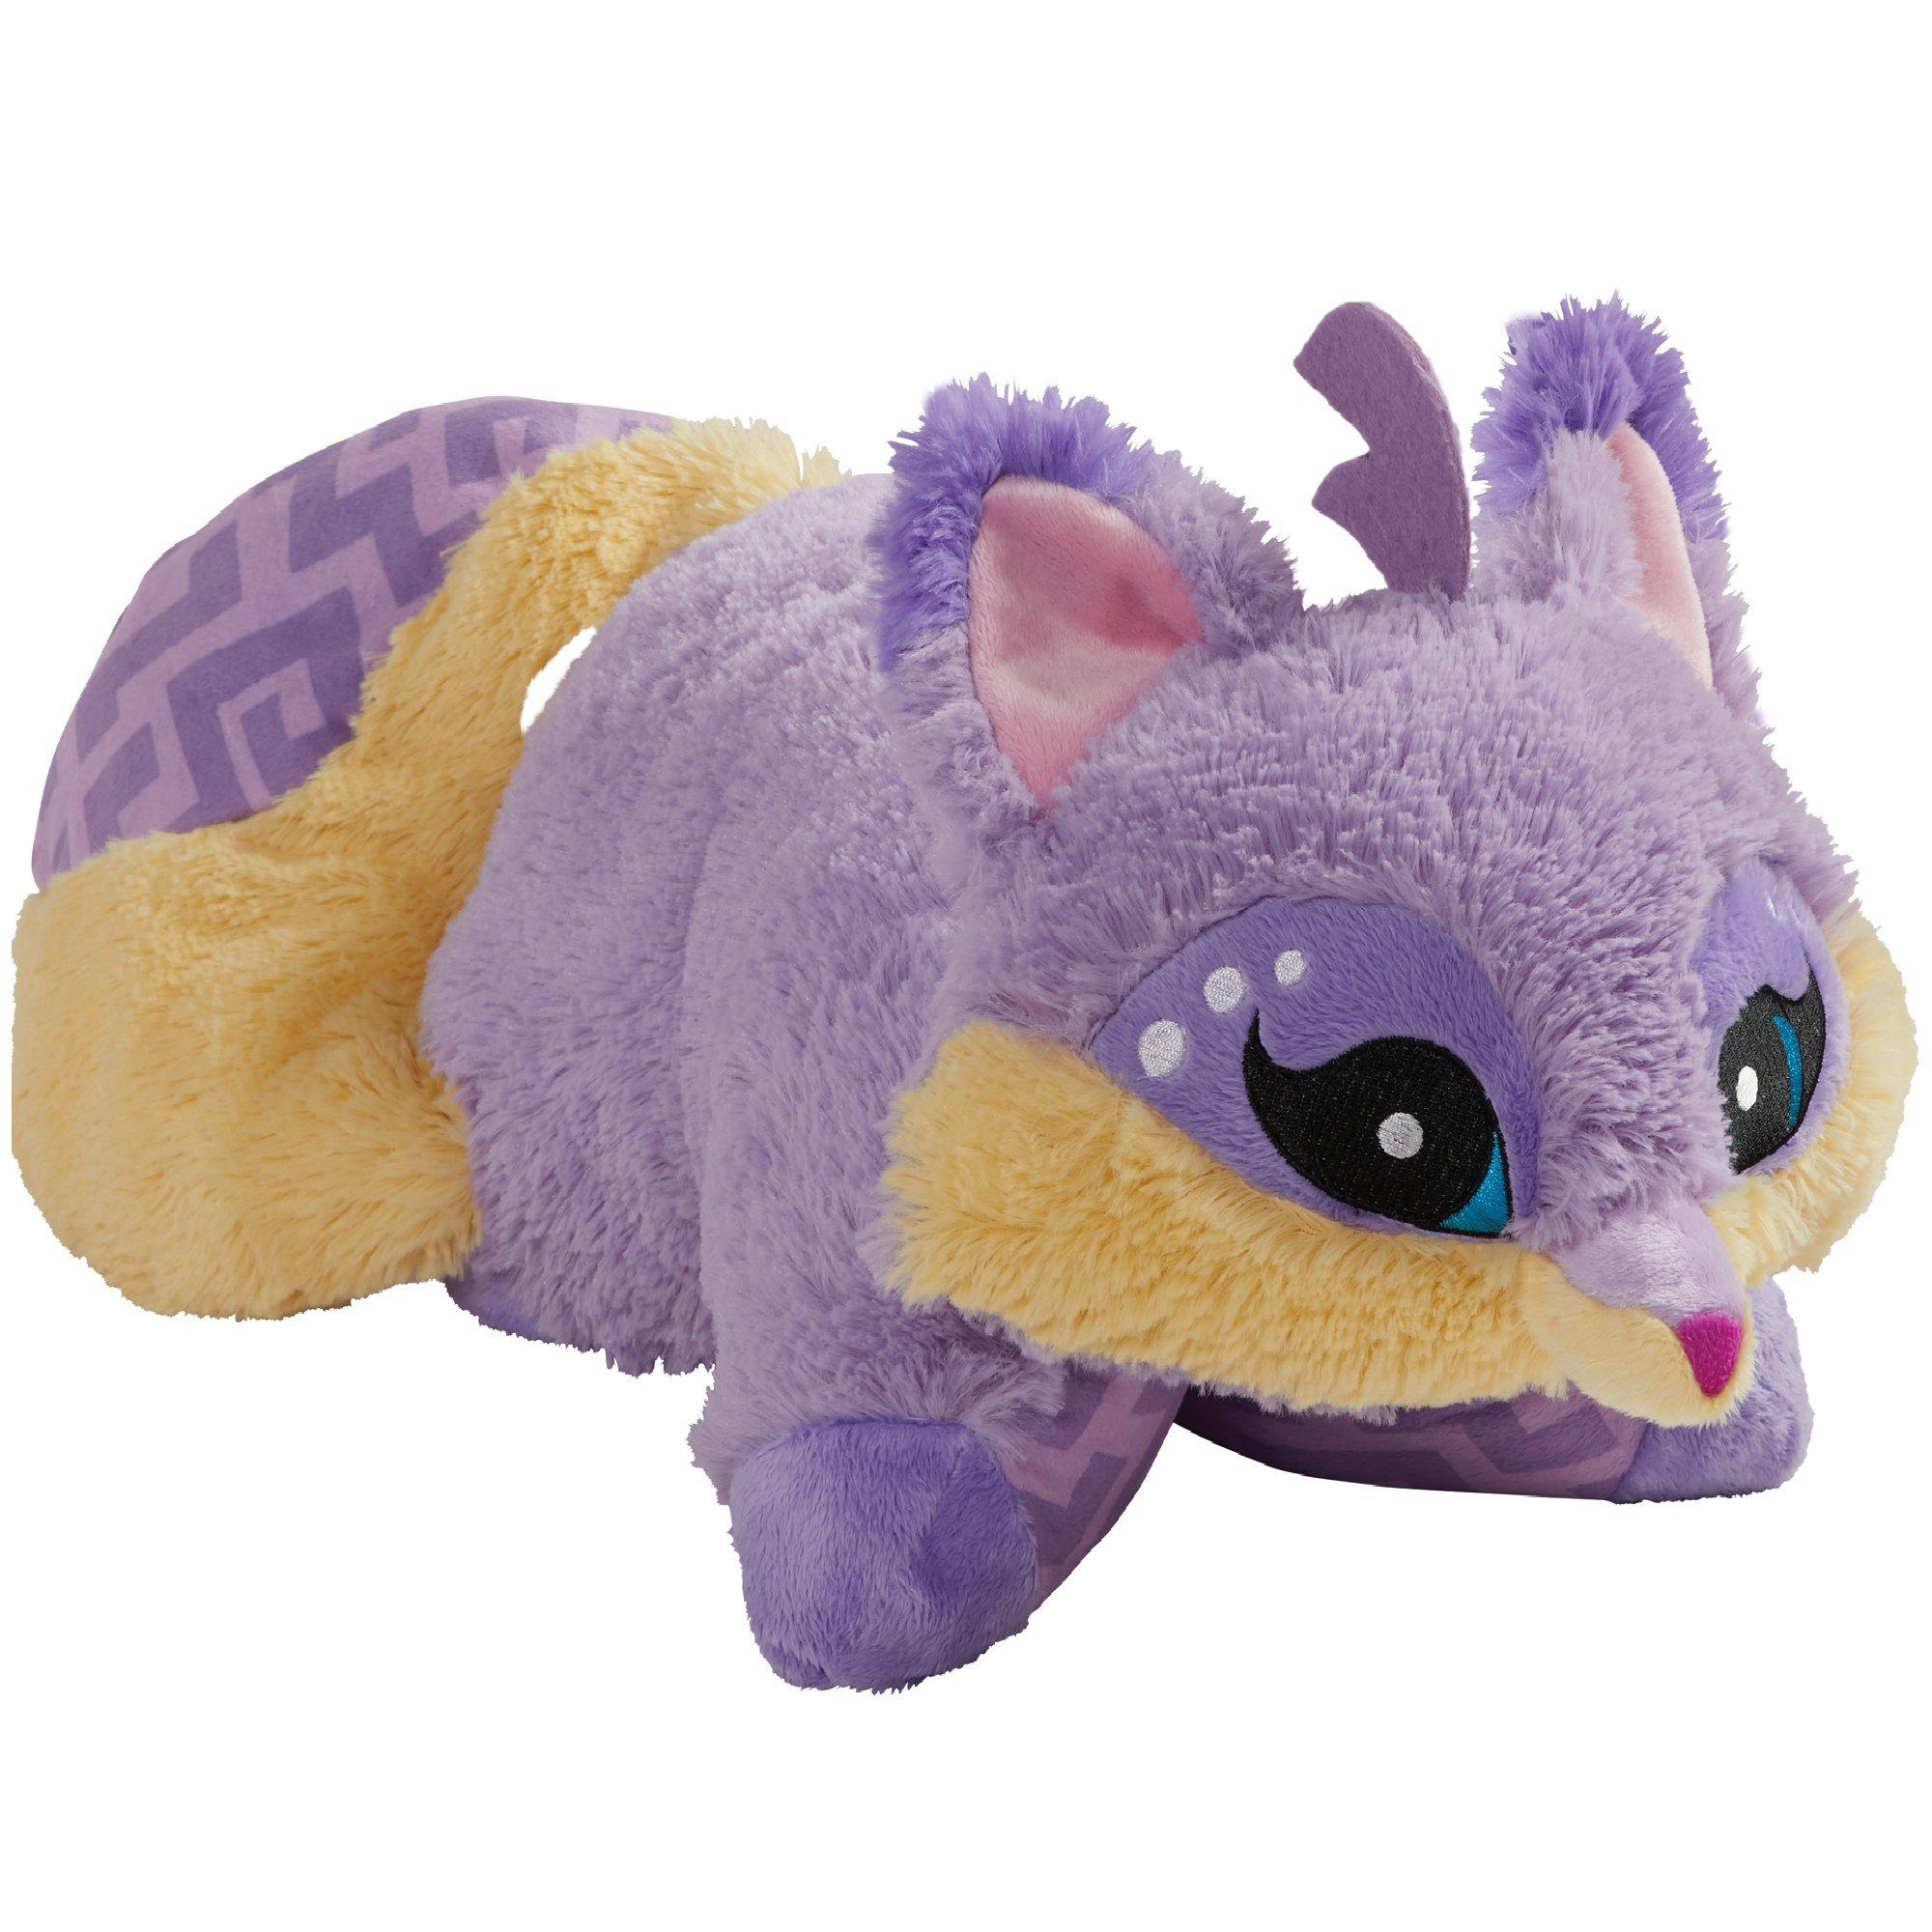 Pillow Pets Animal Jam, Fox, 16'' Super Soft Stuffed Animal Plush Toy